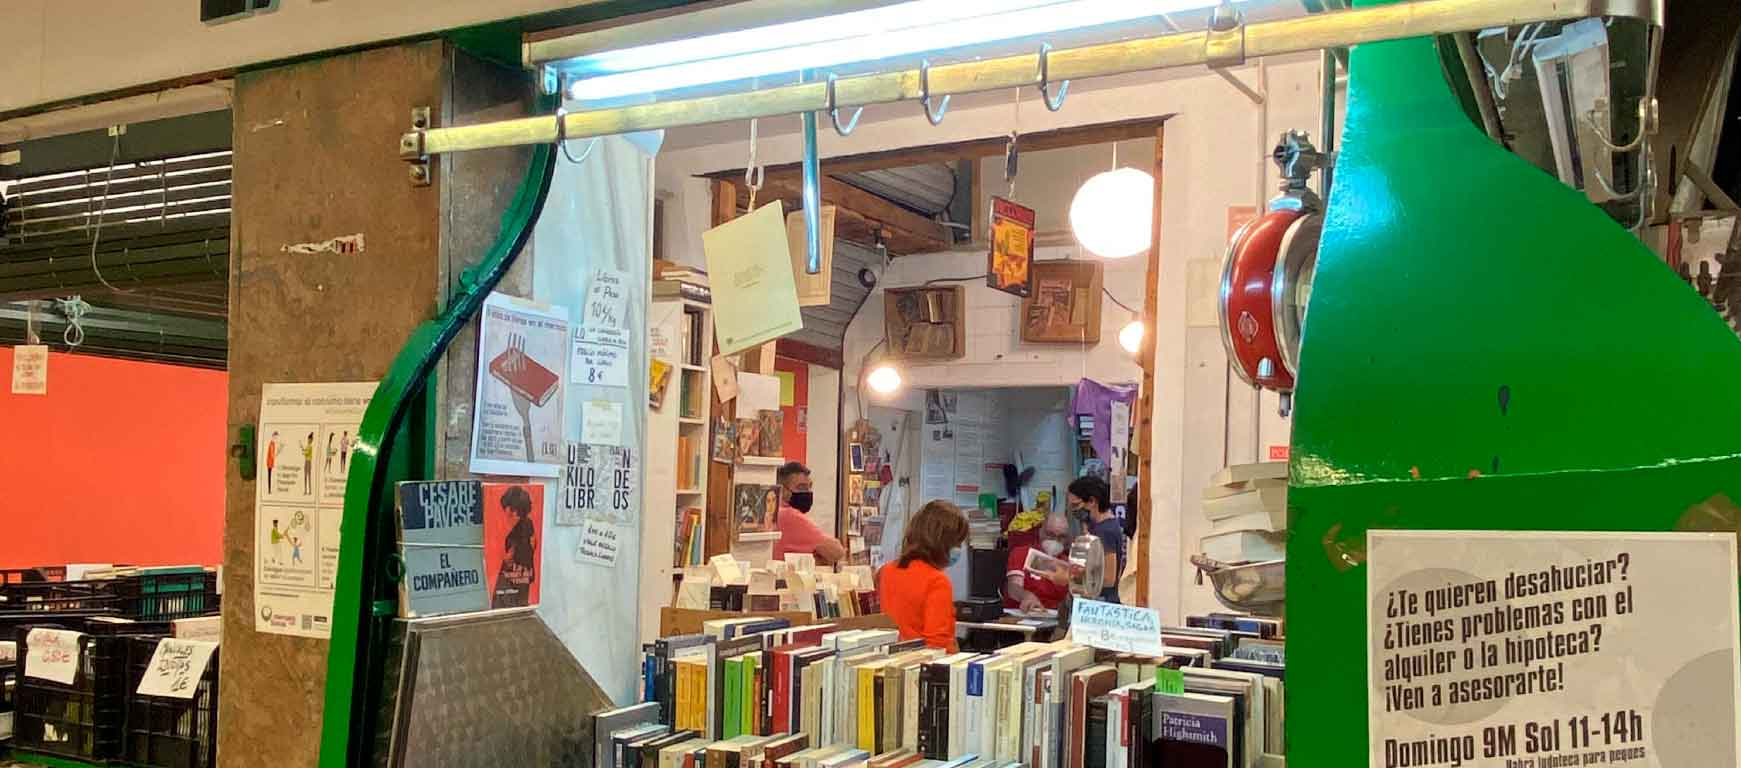 Libreria La Casqueria